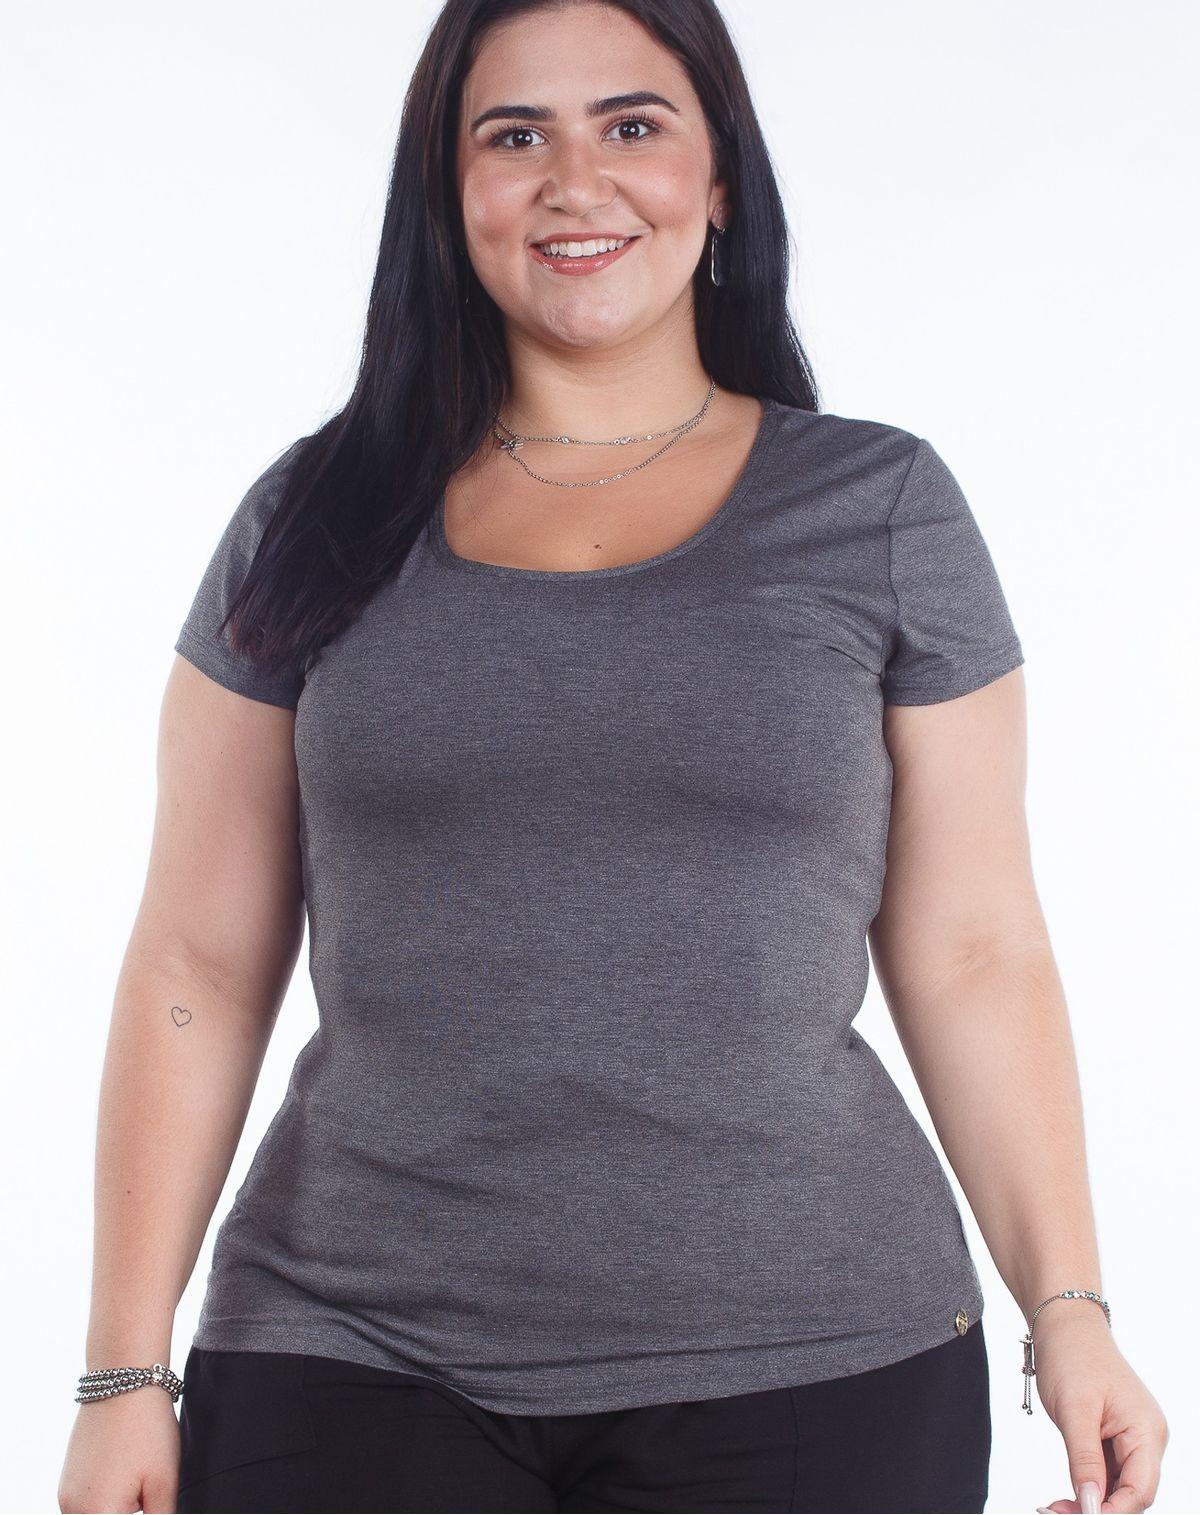 2050005941110-Camiseta-Basica-Manga-Curta-Plus-Feminina-MESCLA-CHUMBO-P-1